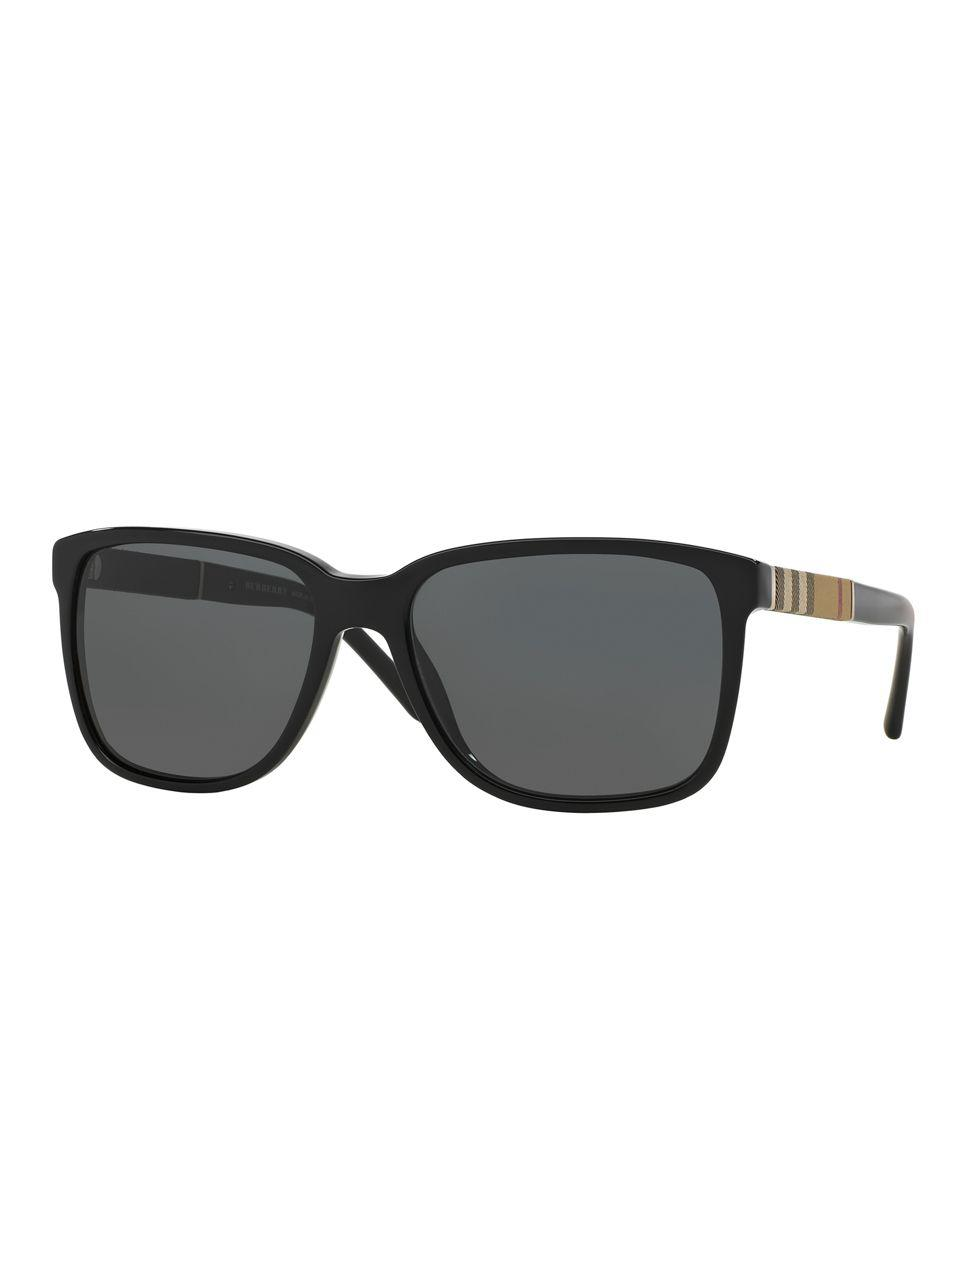 45380a5fceb09 Burberry - Black 58mm Check-print Wayfarer Sunglasses for Men - Lyst. View  fullscreen